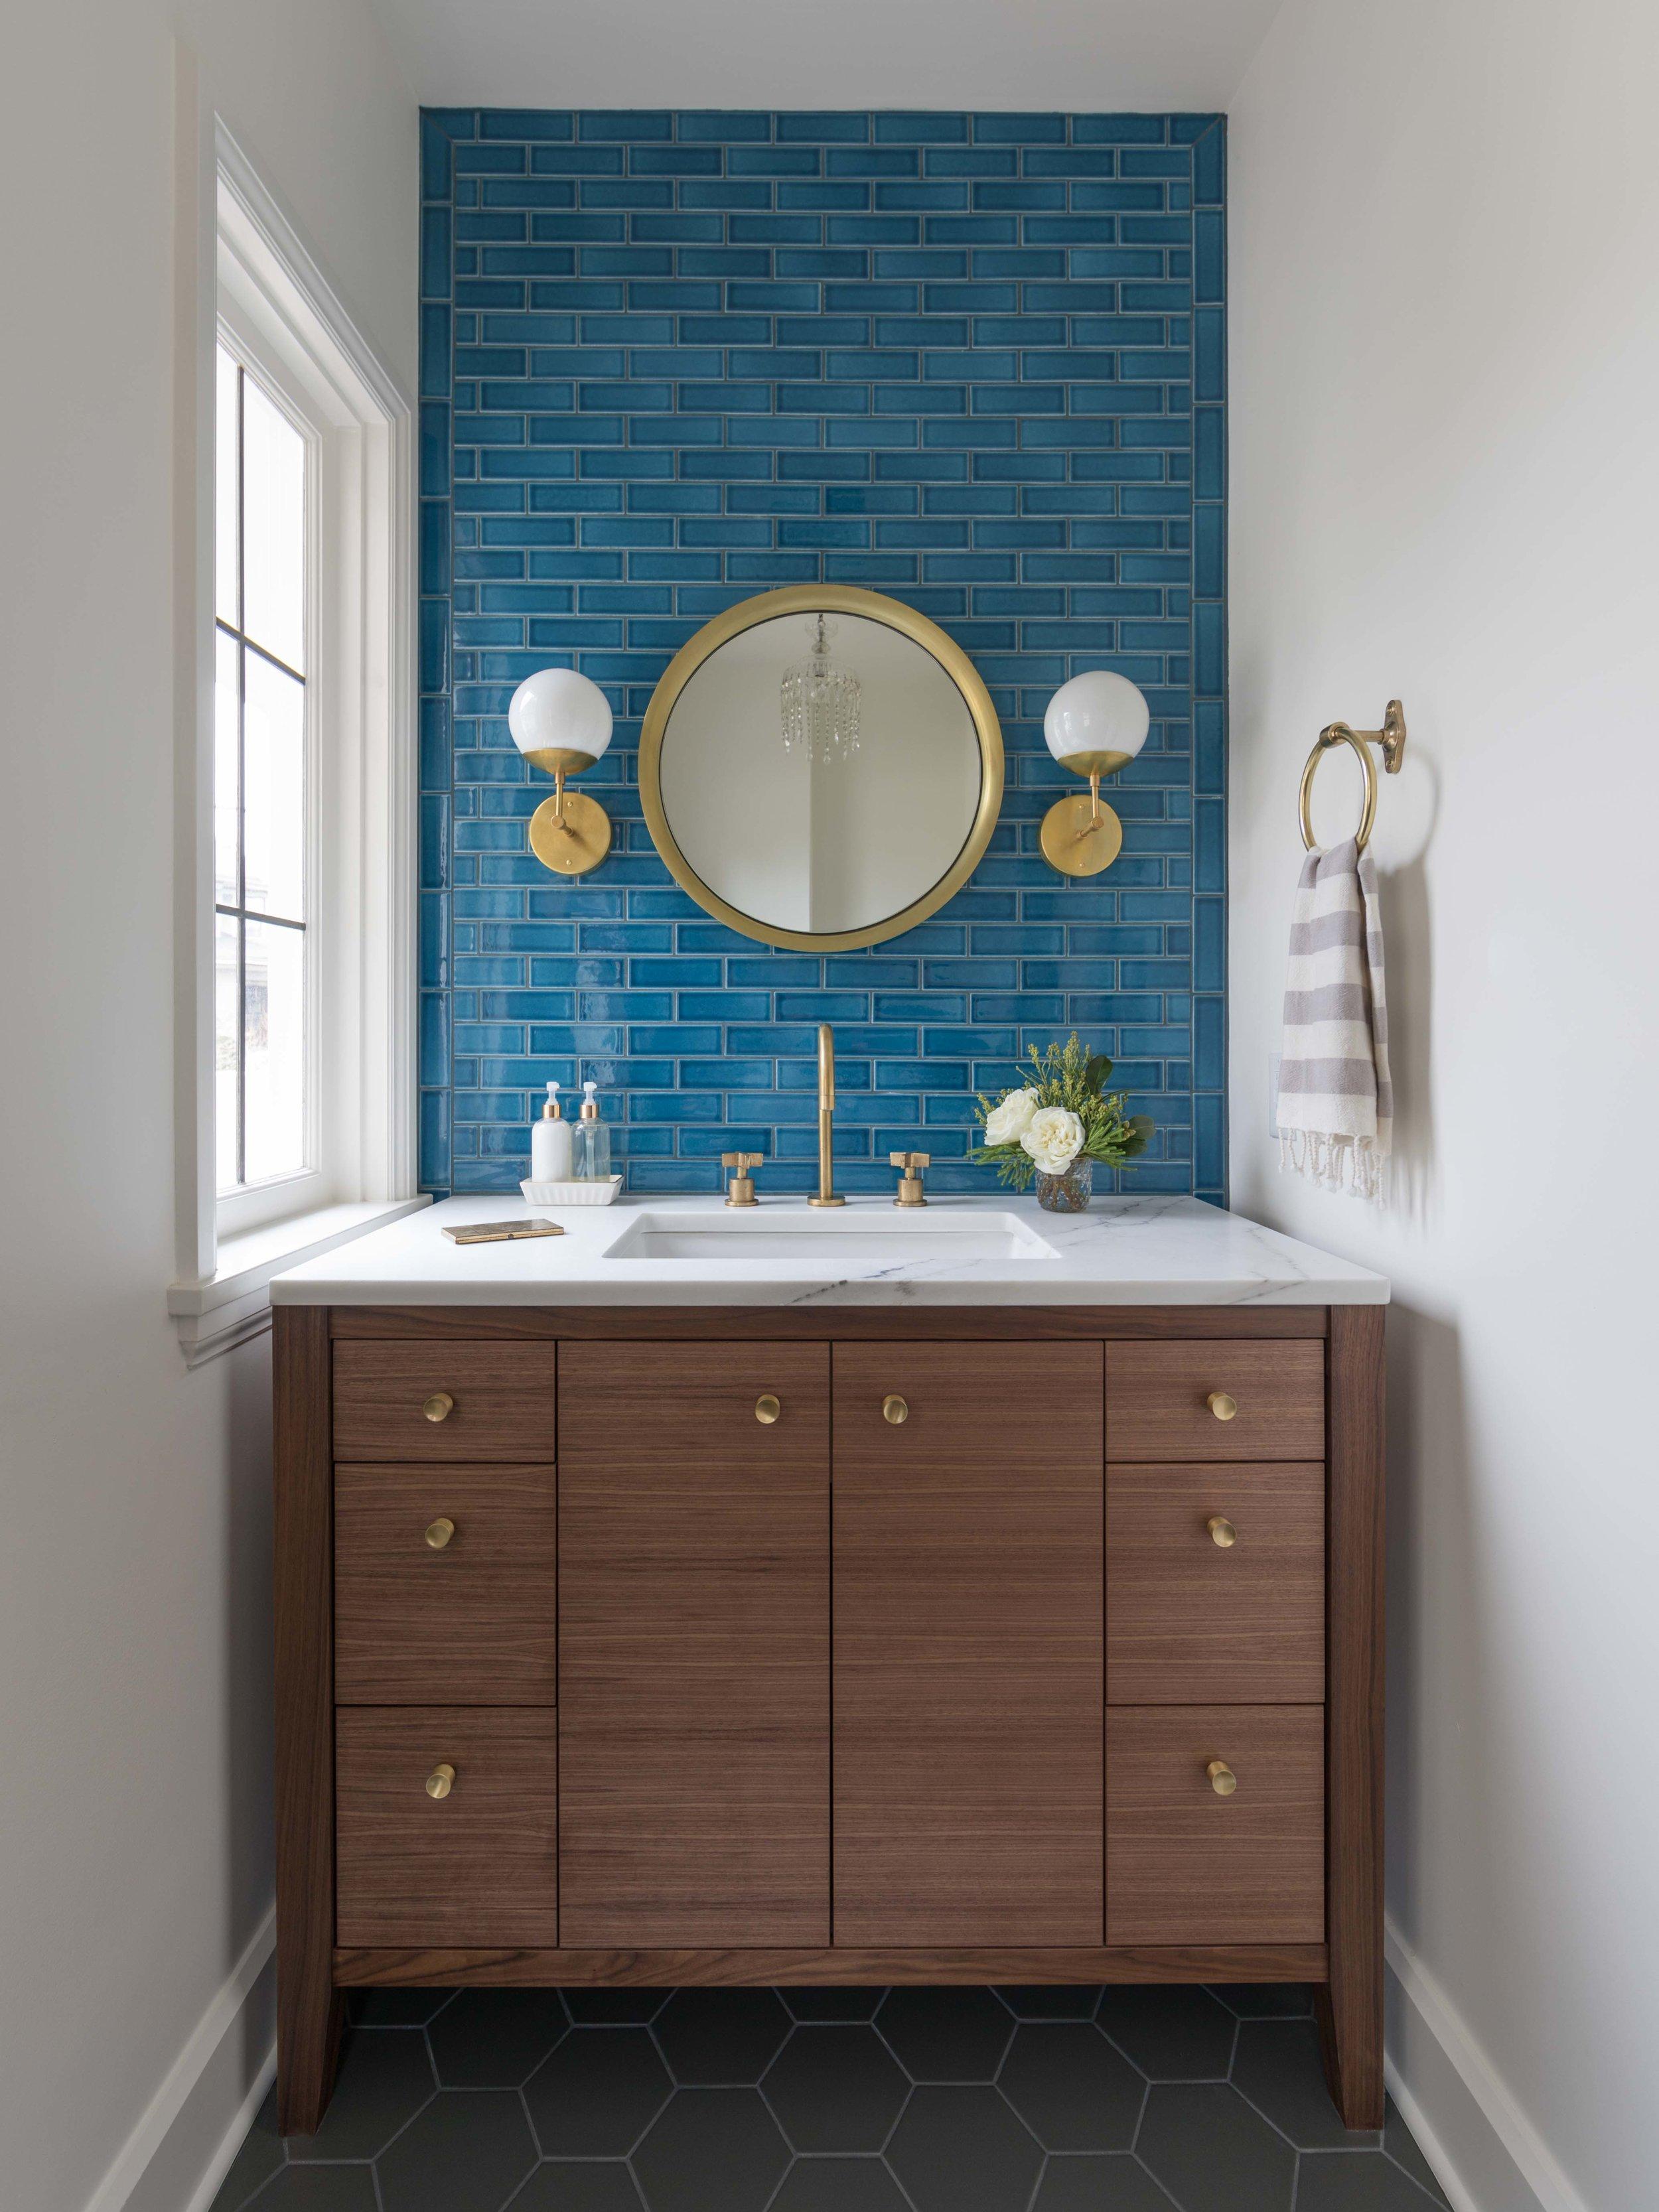 Small Bathroom with Blue Tile & Brass Details | Casework Interior Design | Portland, OR